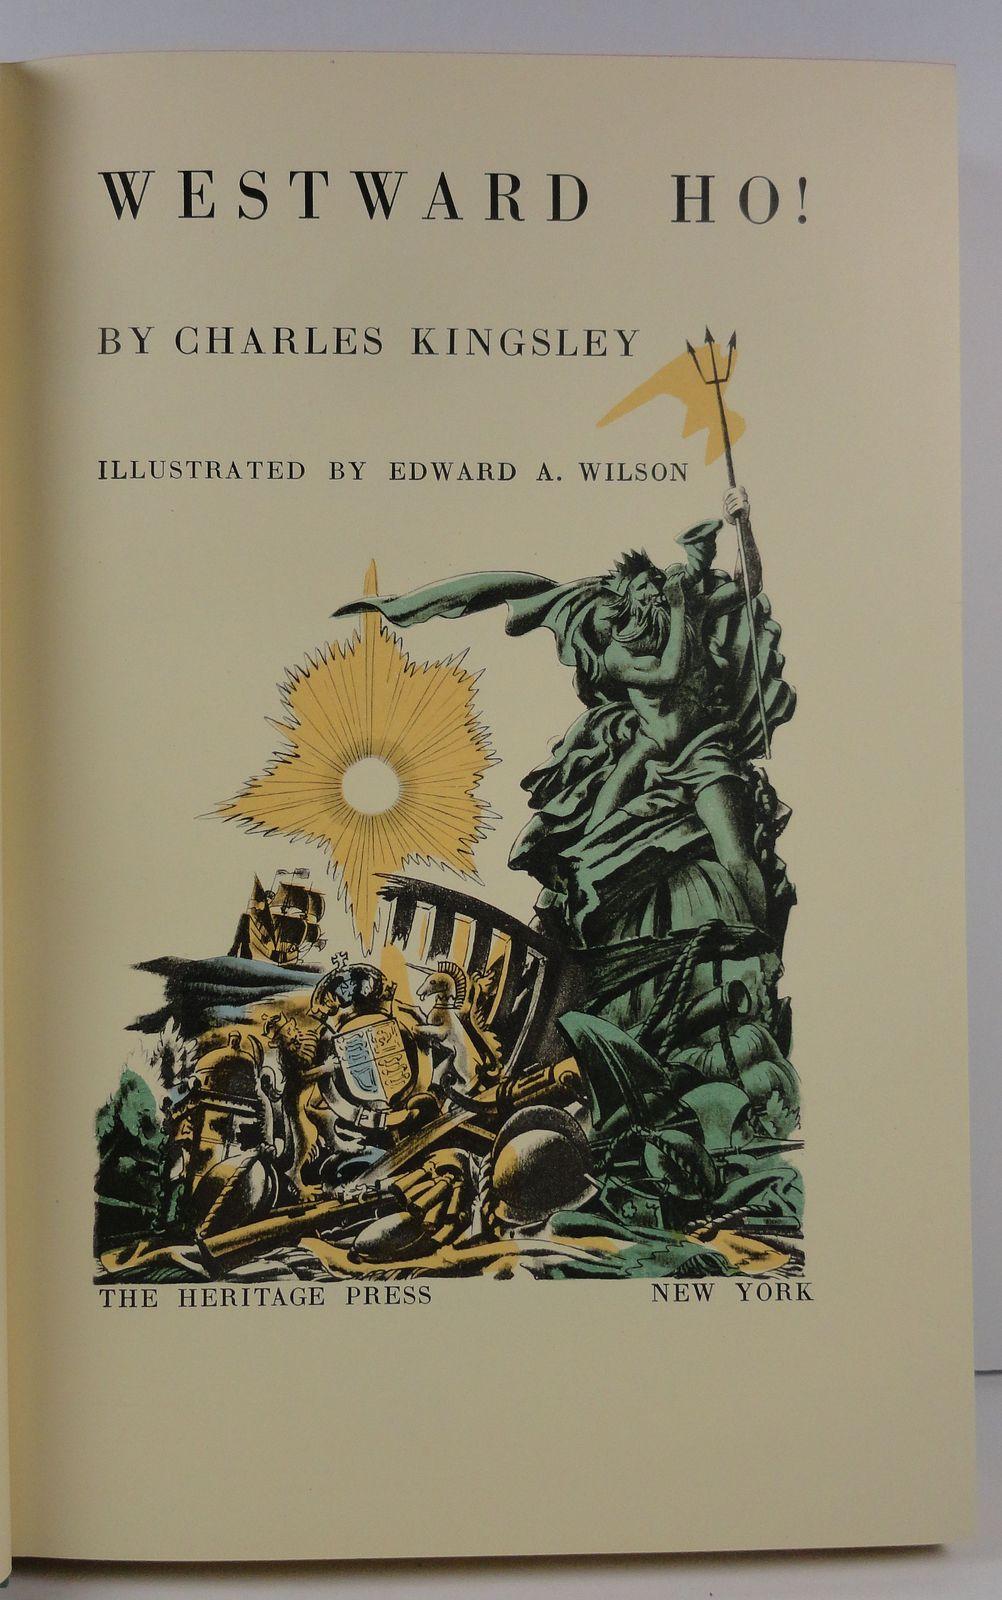 Westward Ho! by Charles Kingsley The Heritage Press